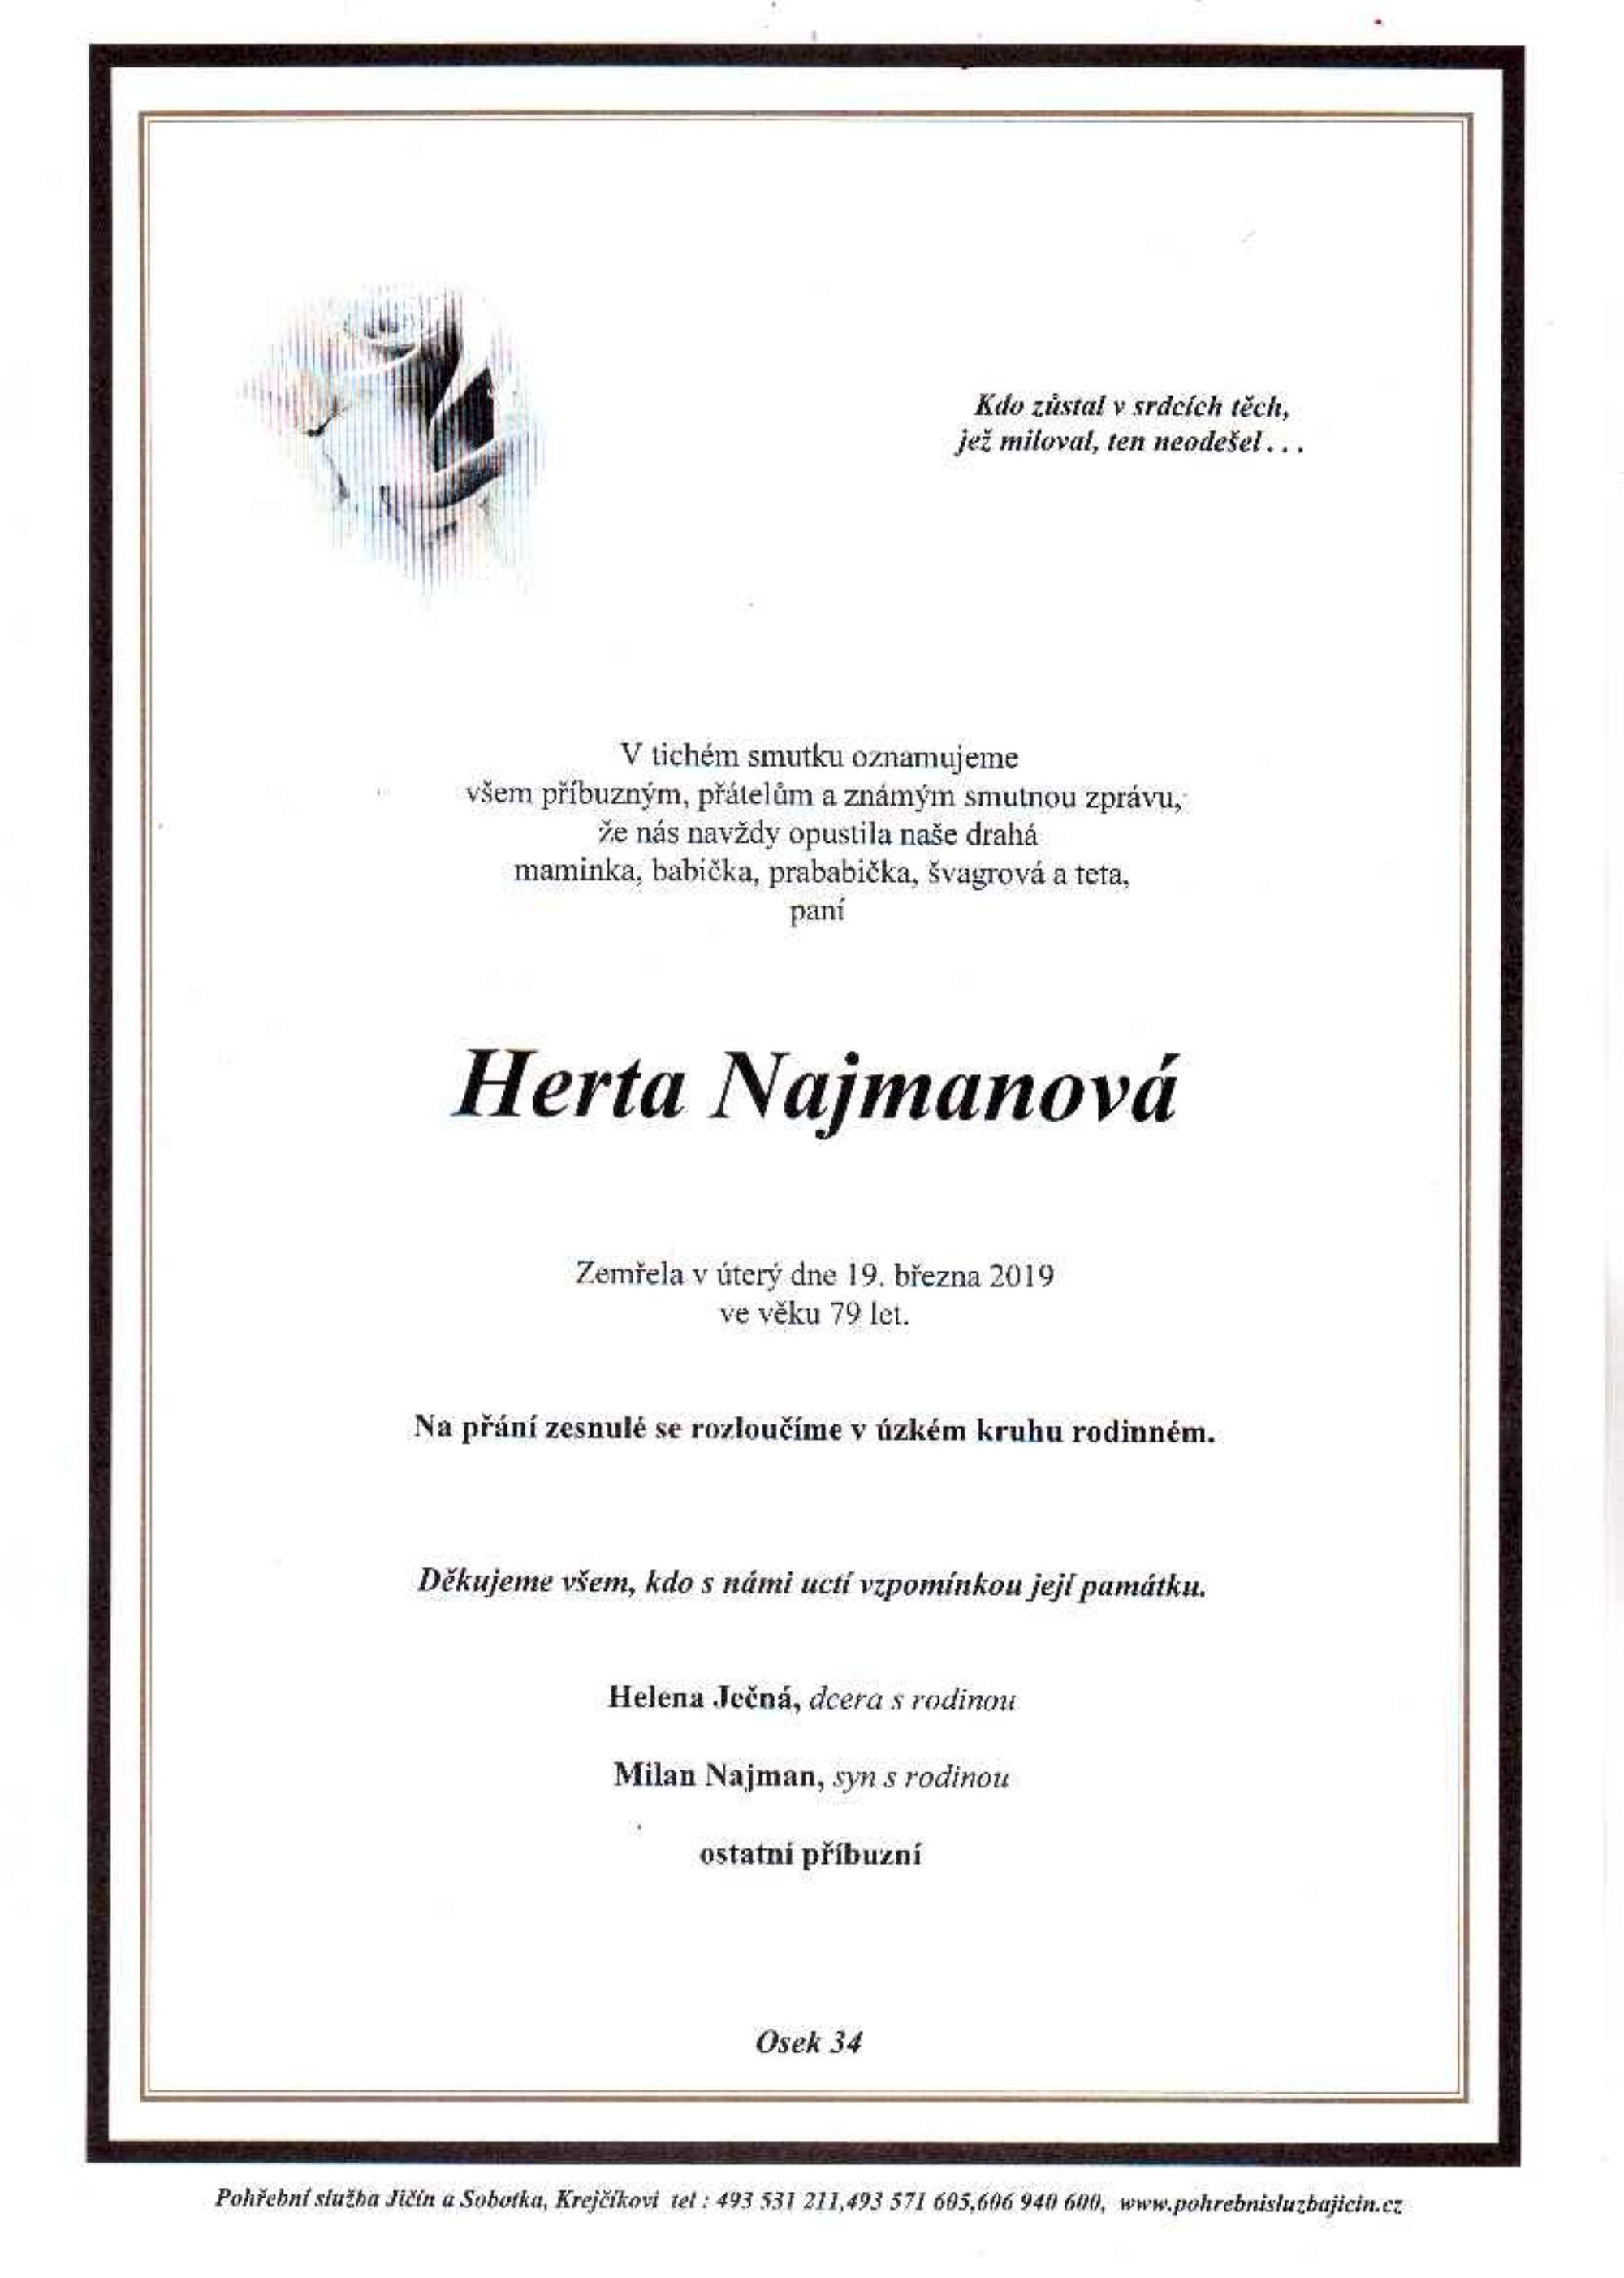 Herta Najmanová